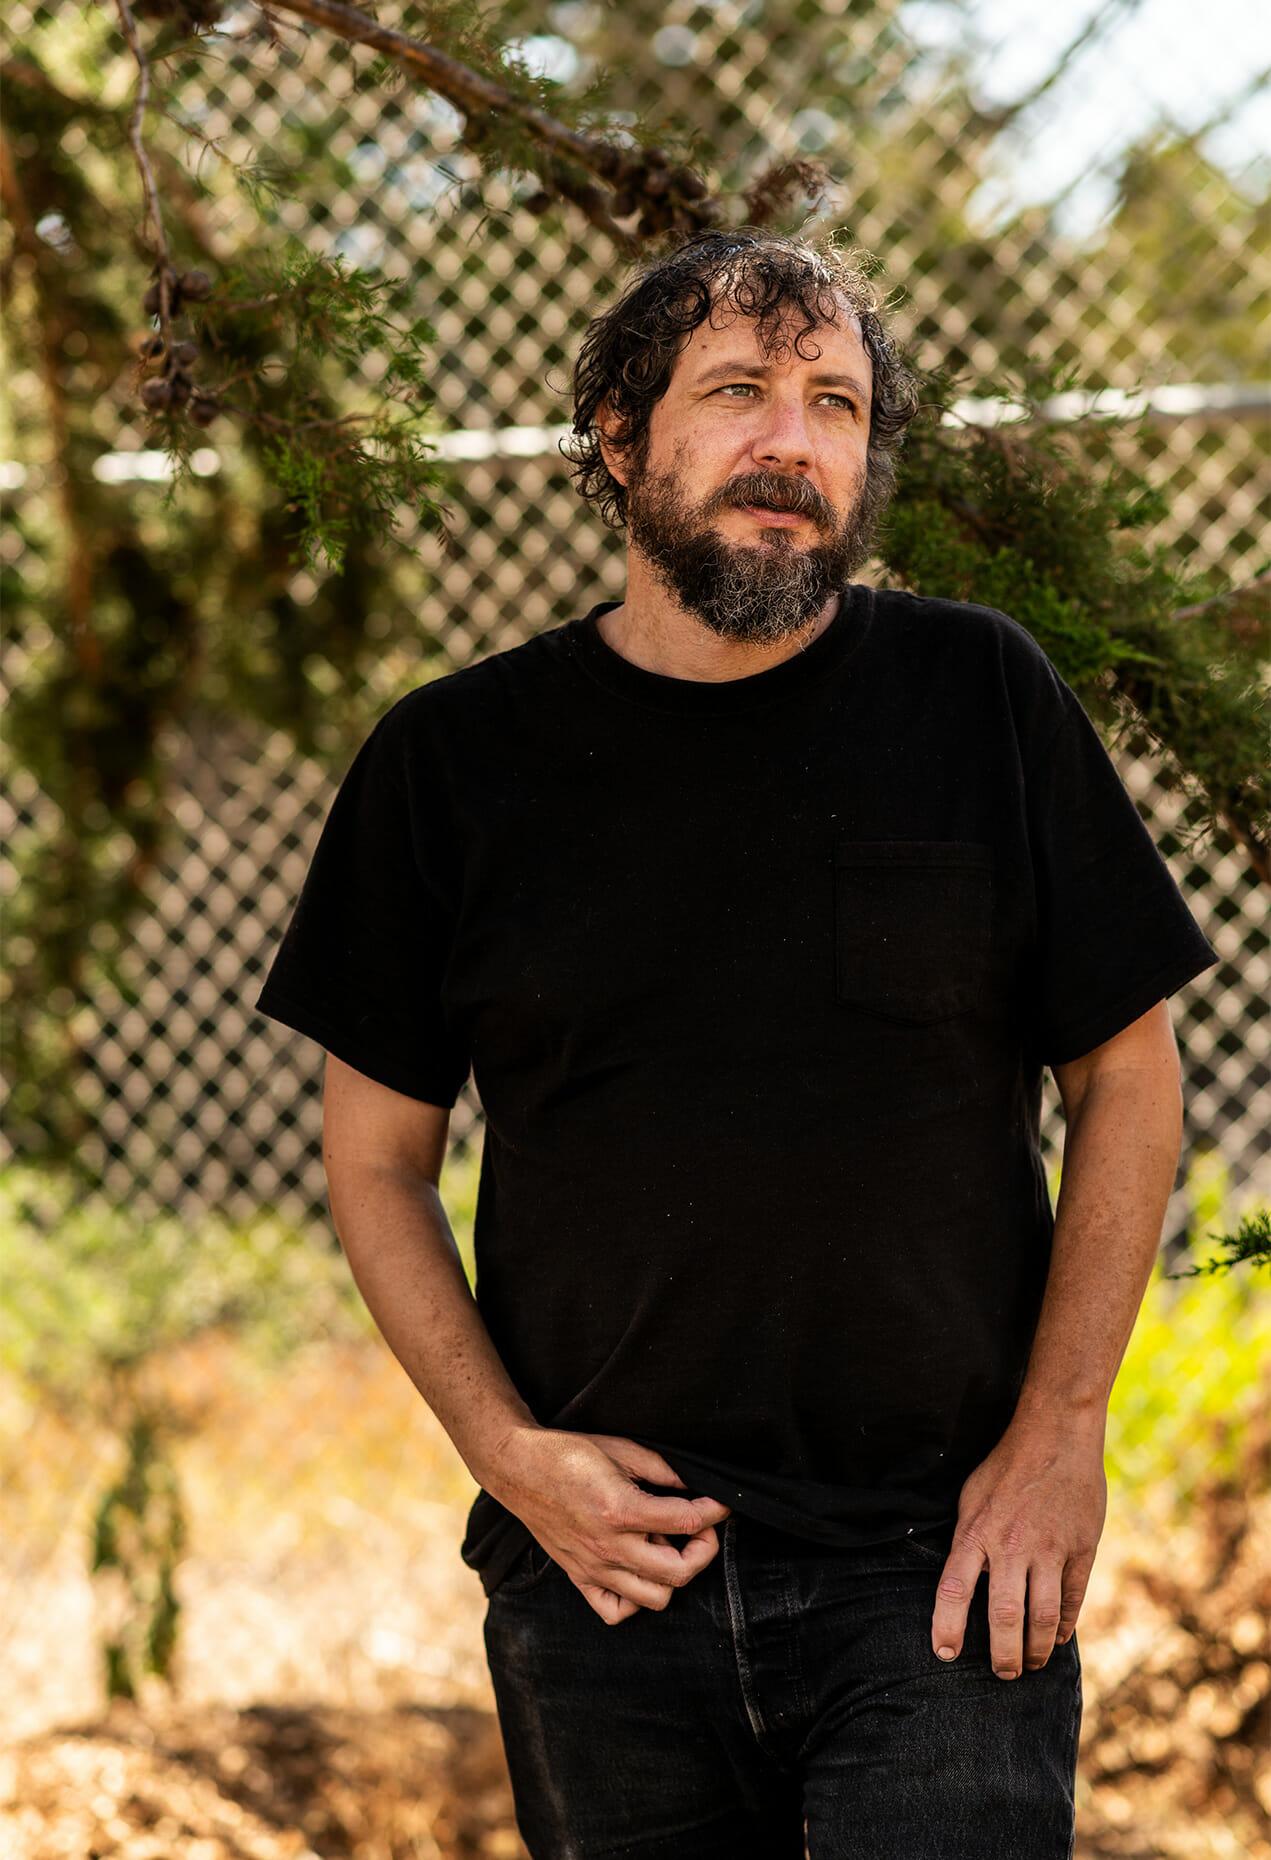 Portrait of Dave who lives in a camper van